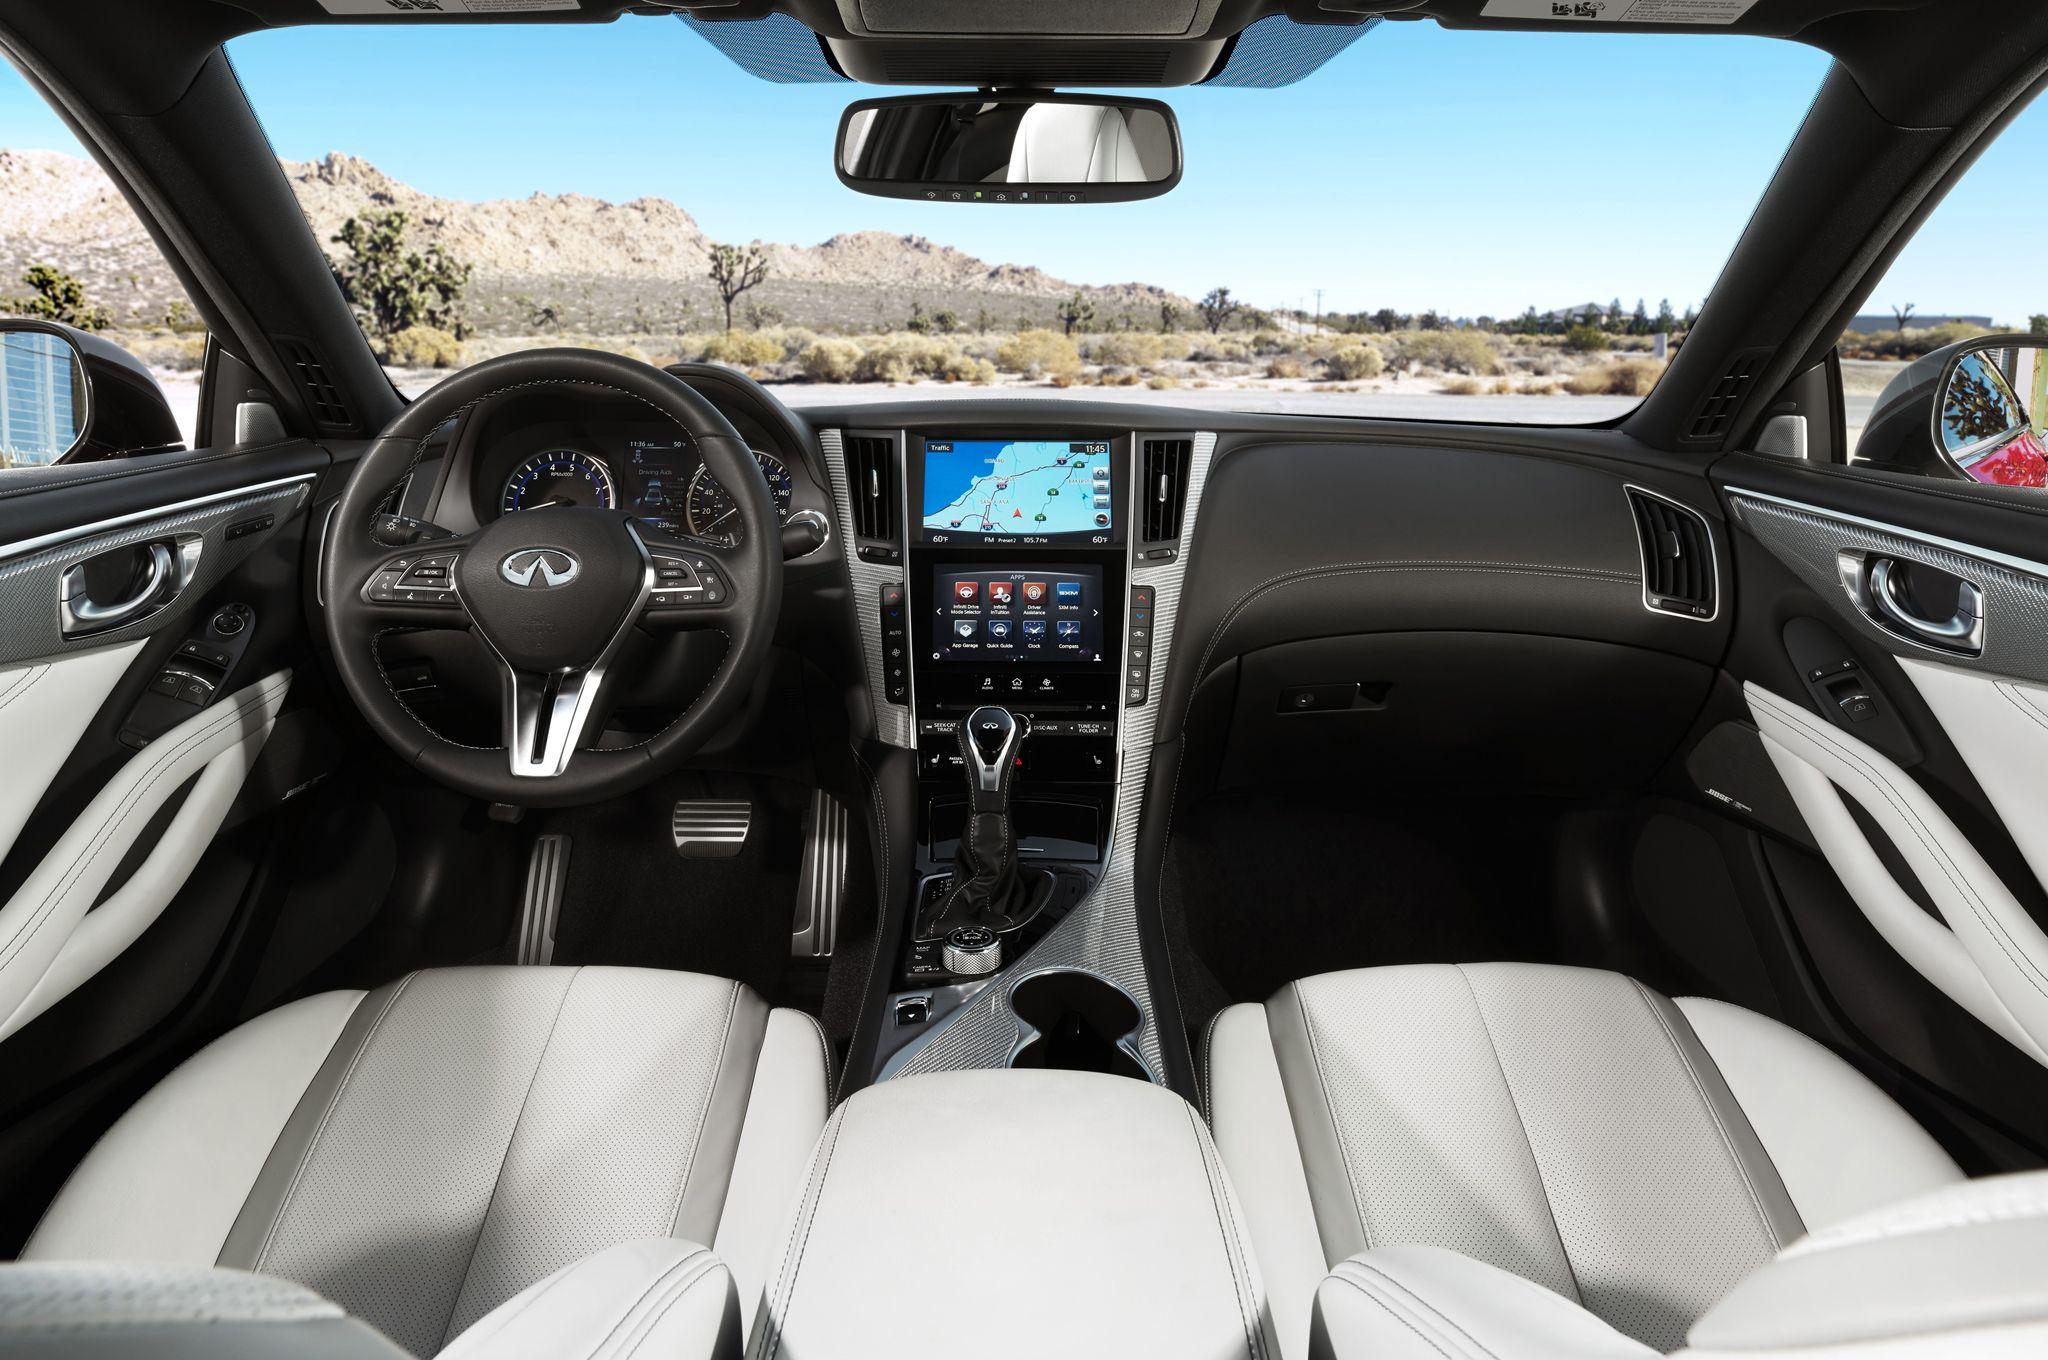 2017 Infiniti Q60 Coupe Interior Jpg Imagen Jpeg 2048 1360